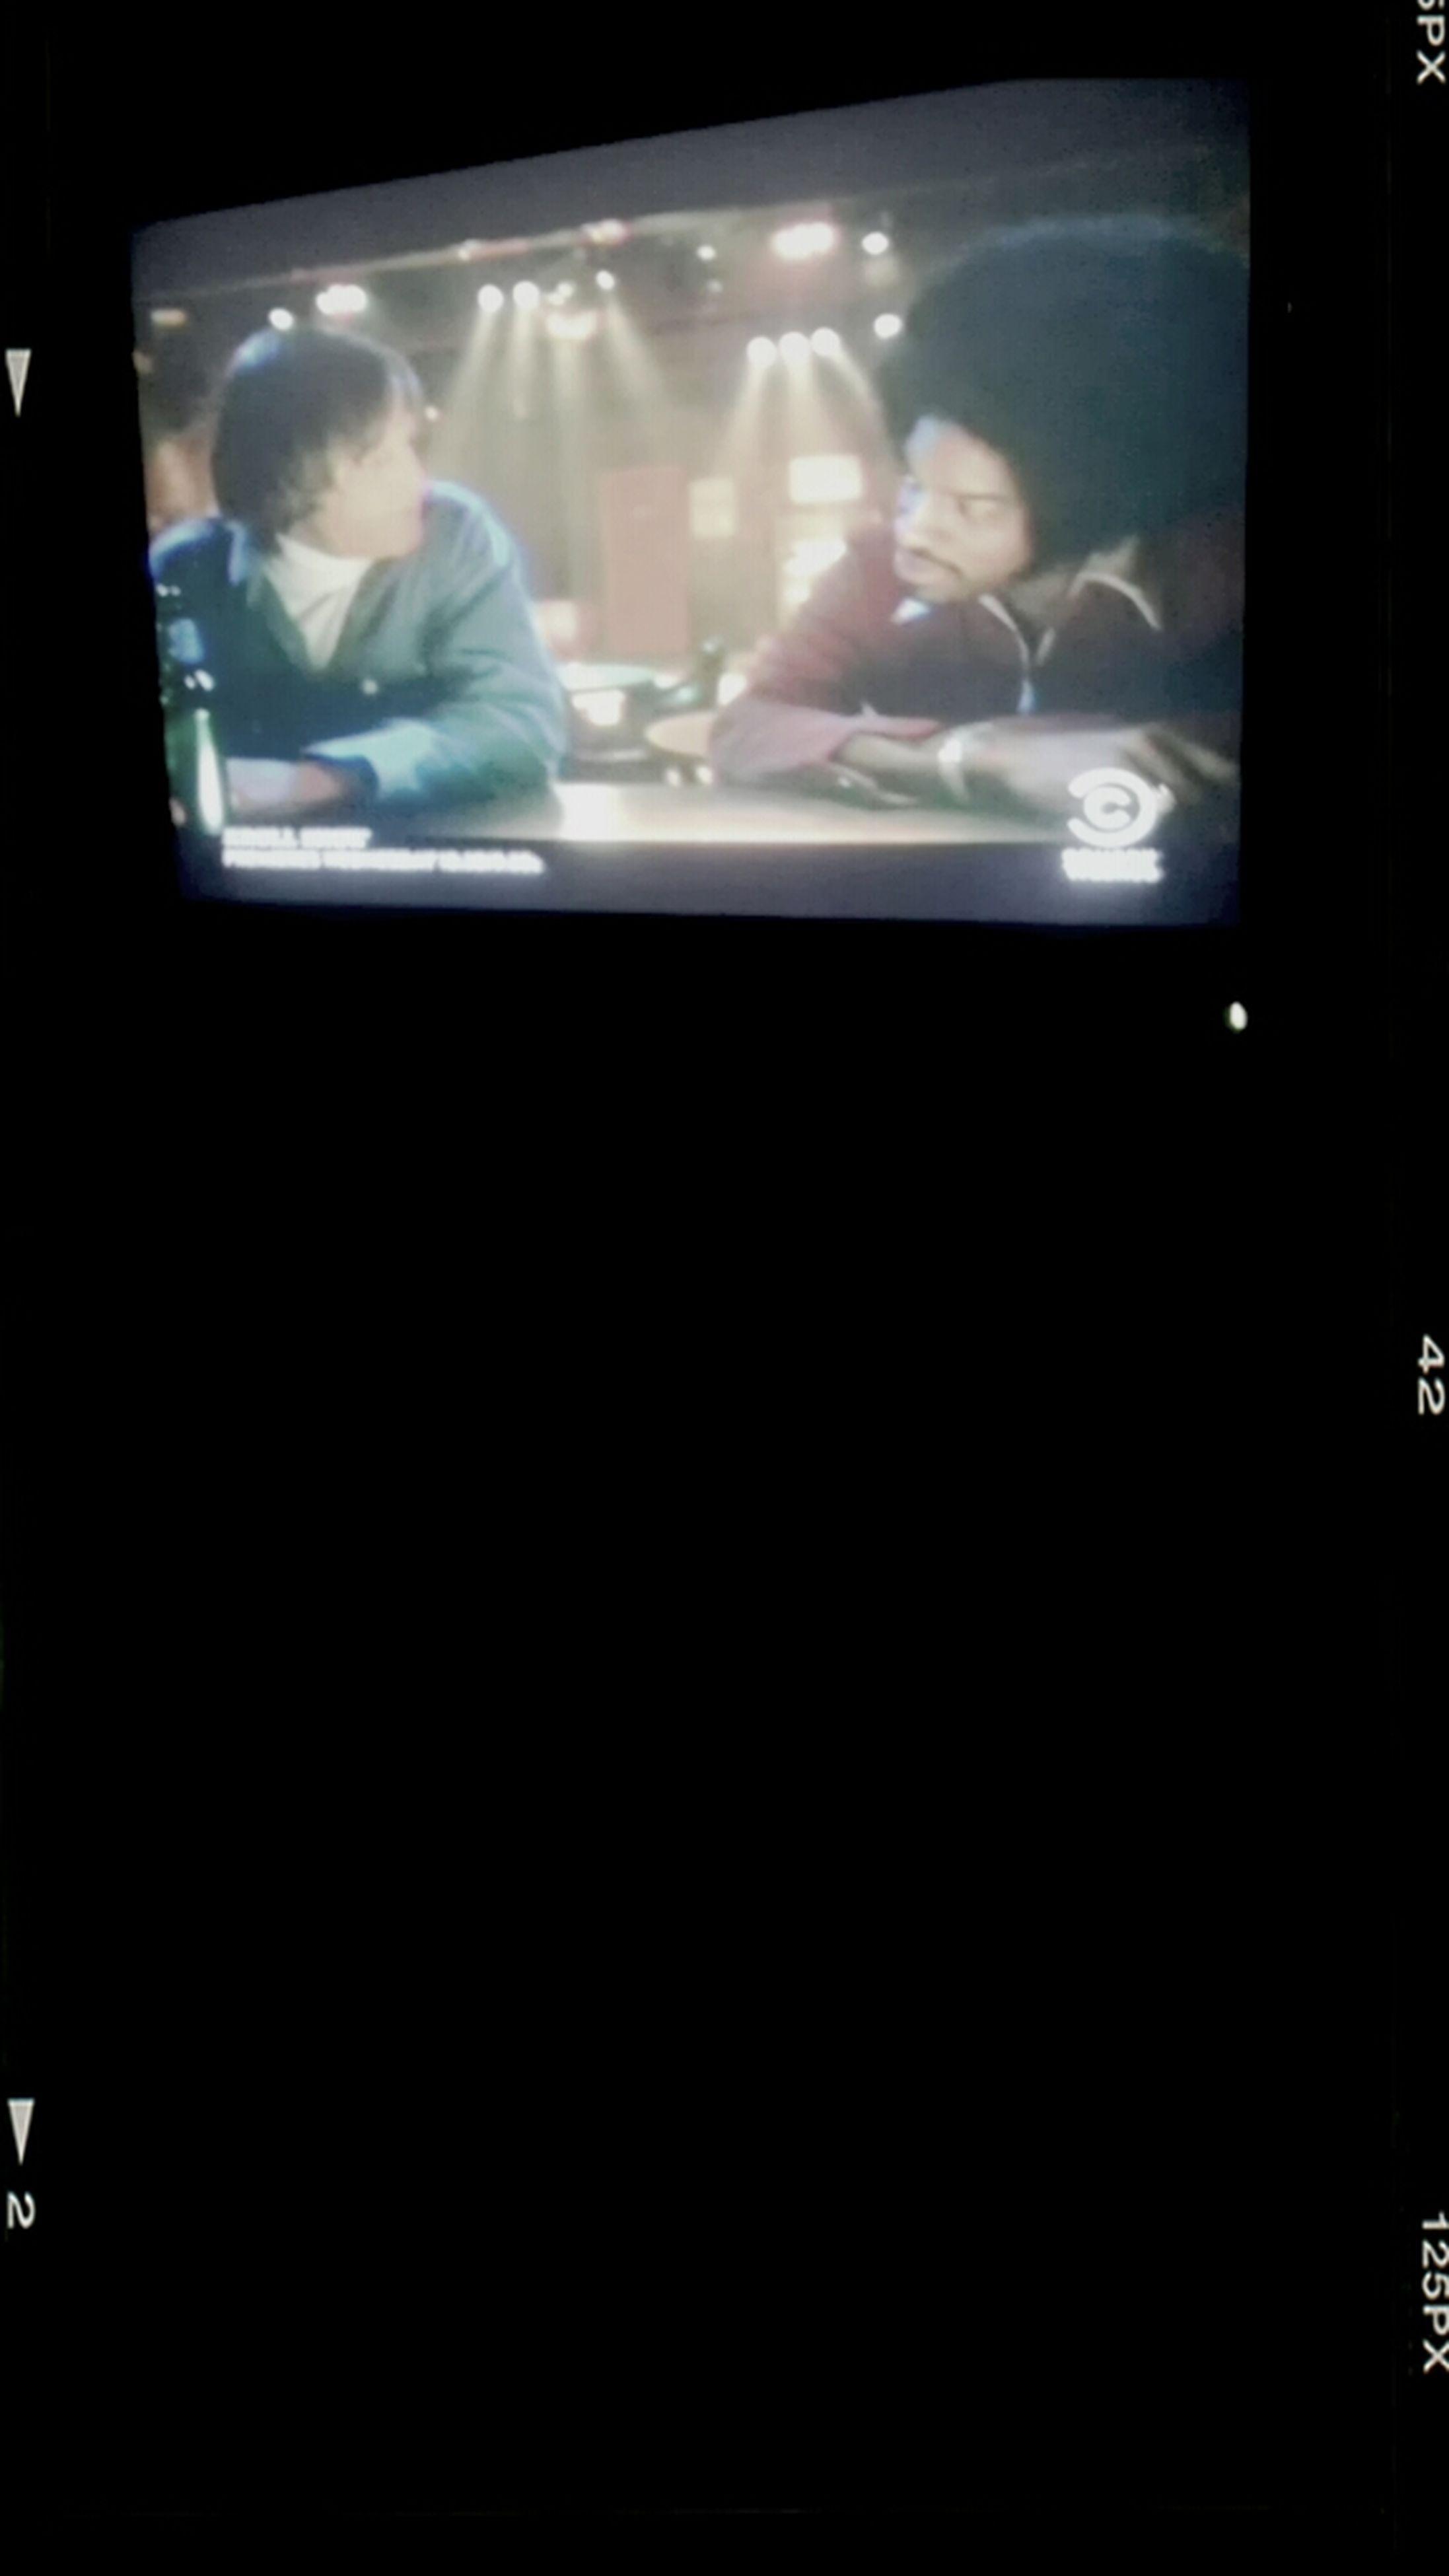 indoors, transfer print, dark, auto post production filter, illuminated, night, black background, darkroom, glass - material, home interior, copy space, close-up, window, no people, transparent, light - natural phenomenon, studio shot, glowing, lighting equipment, reflection